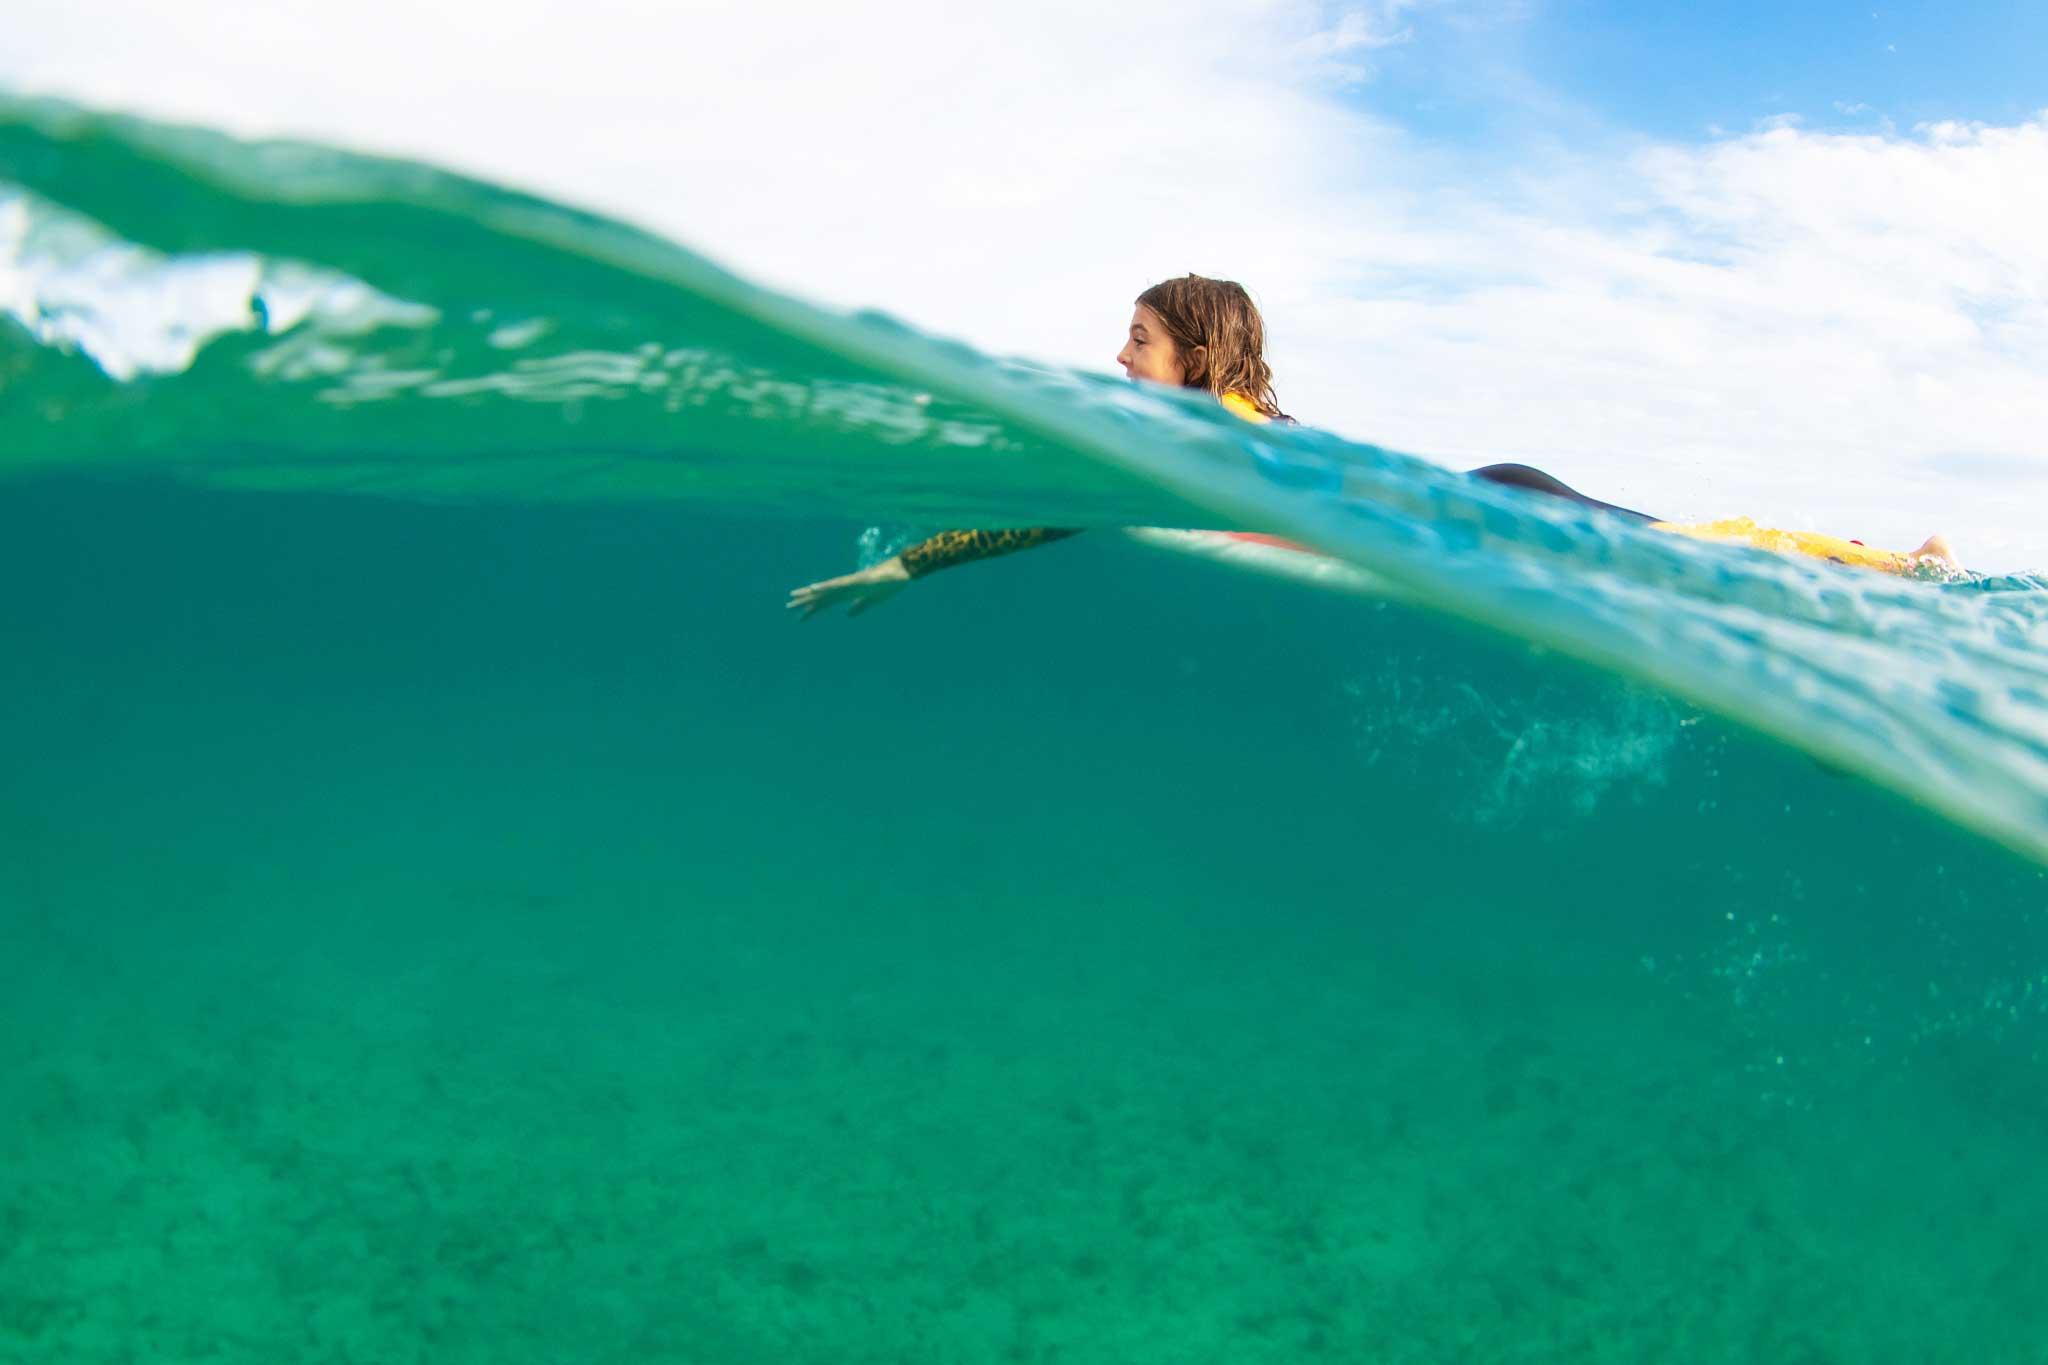 Adriana Hidalgo Fernández, a rosy future in surf | Macaronesia Fuerteventura